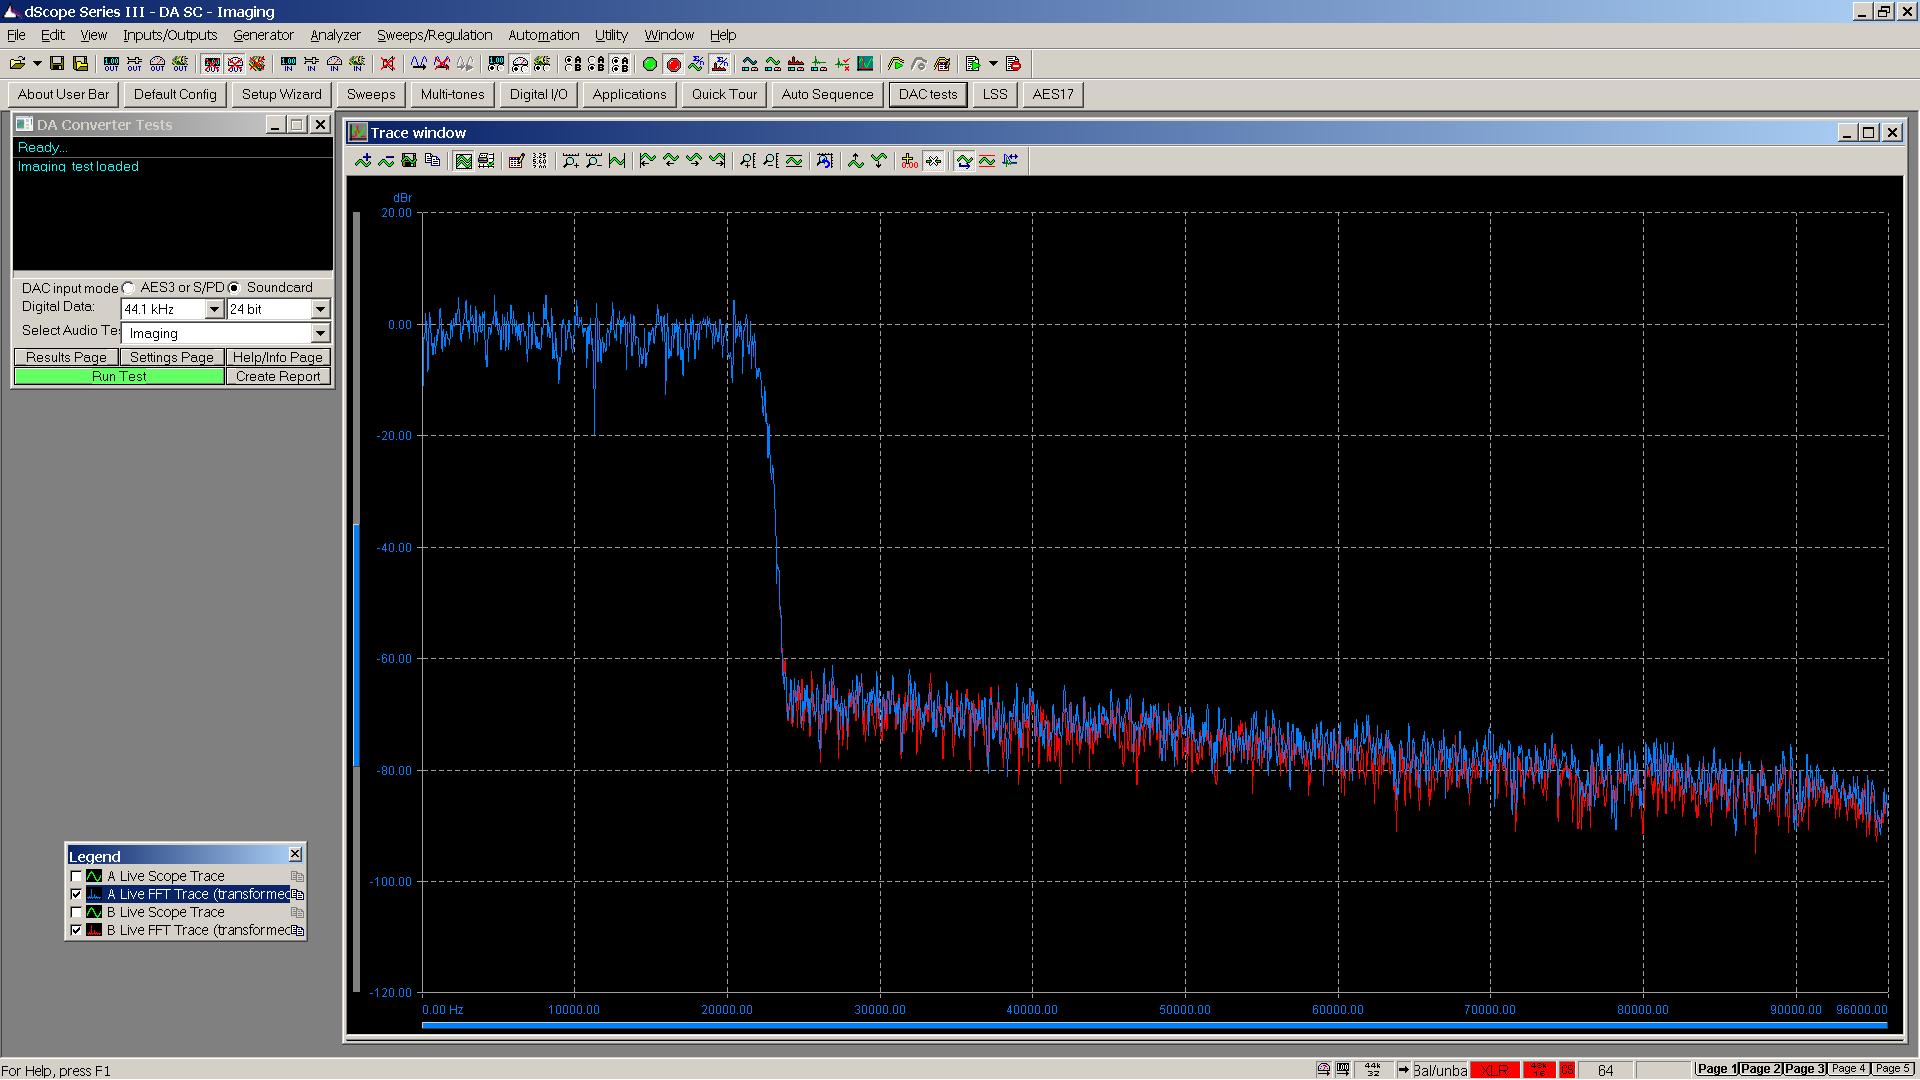 20170423 Audio-gd S19 SE imaging - USB.PNG